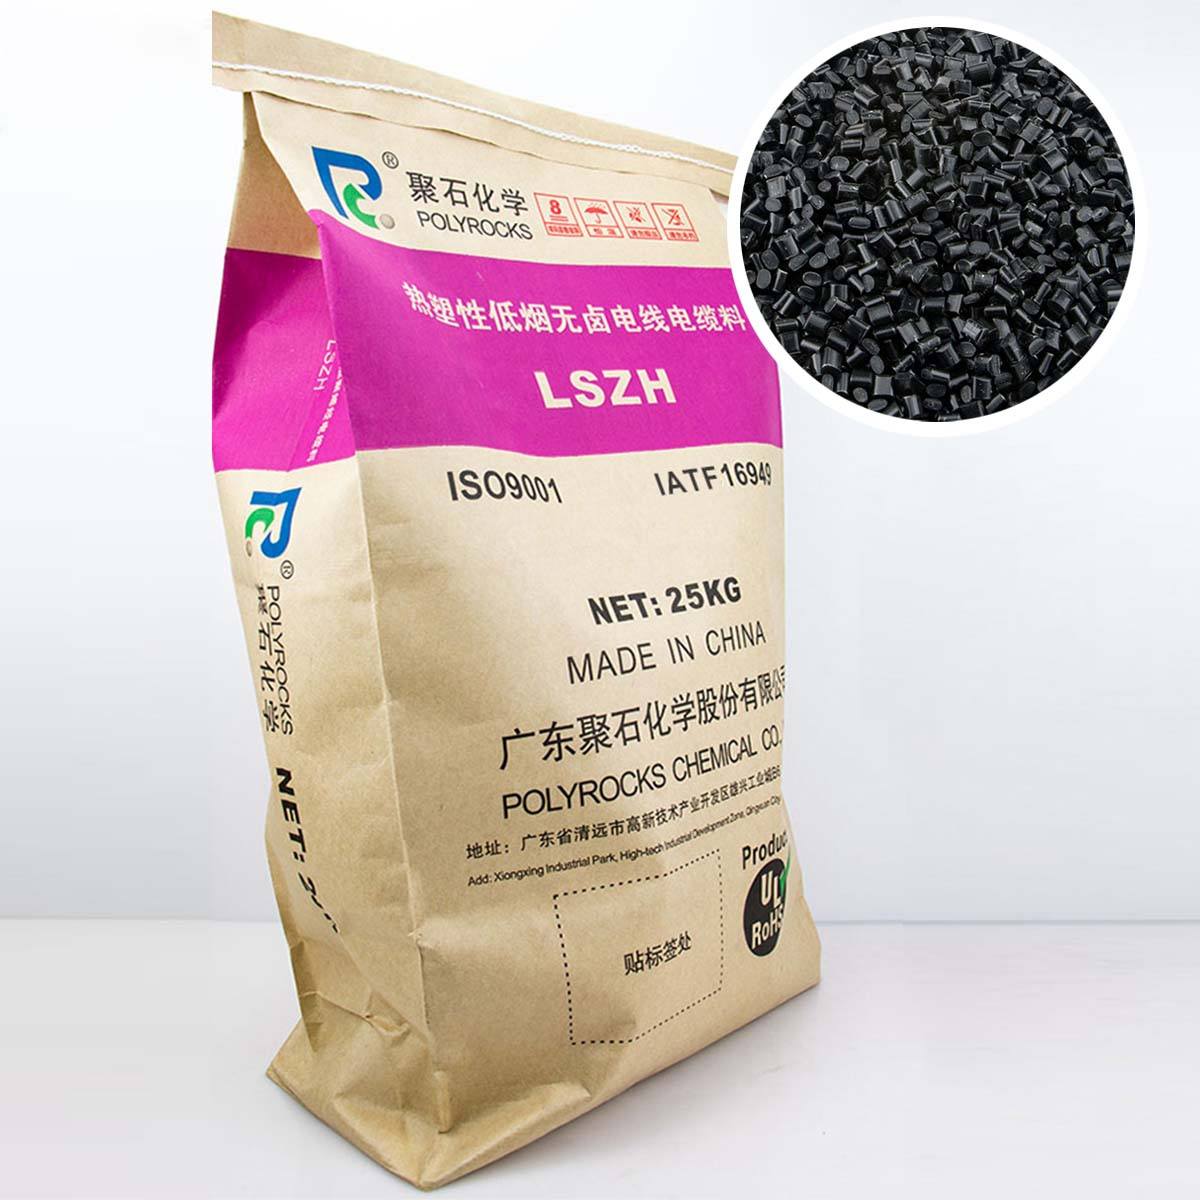 LSZH(黑色粒子)